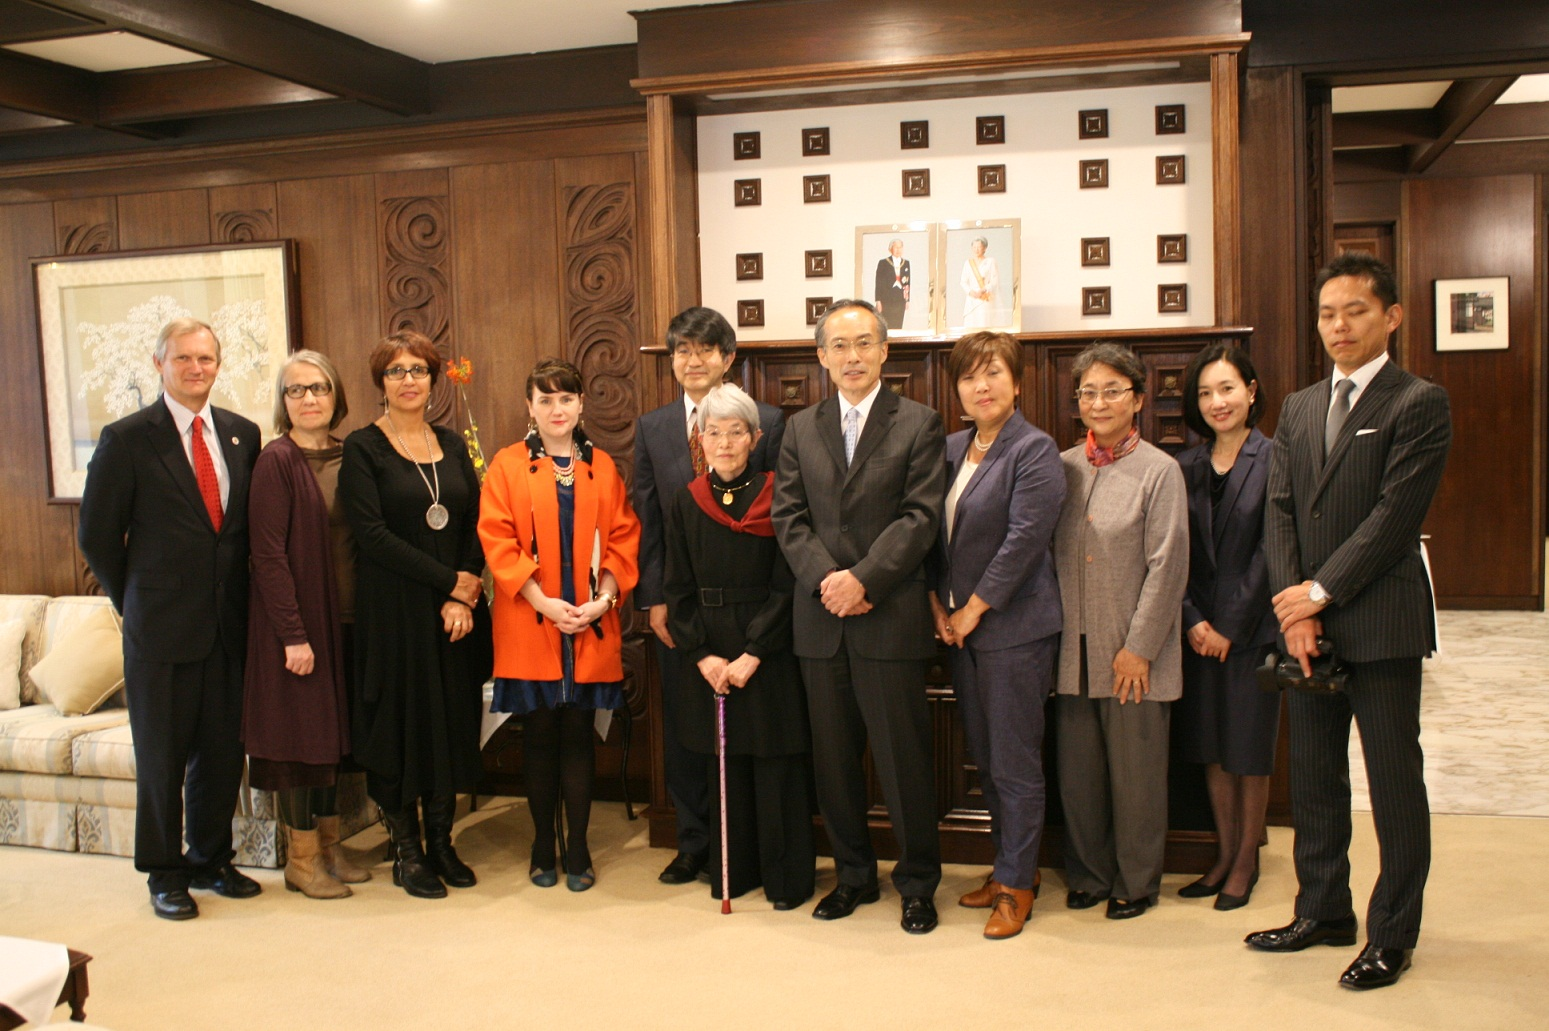 Morimoto Junko 1  森本順子氏外務大臣表彰授与式  総領事館の行事